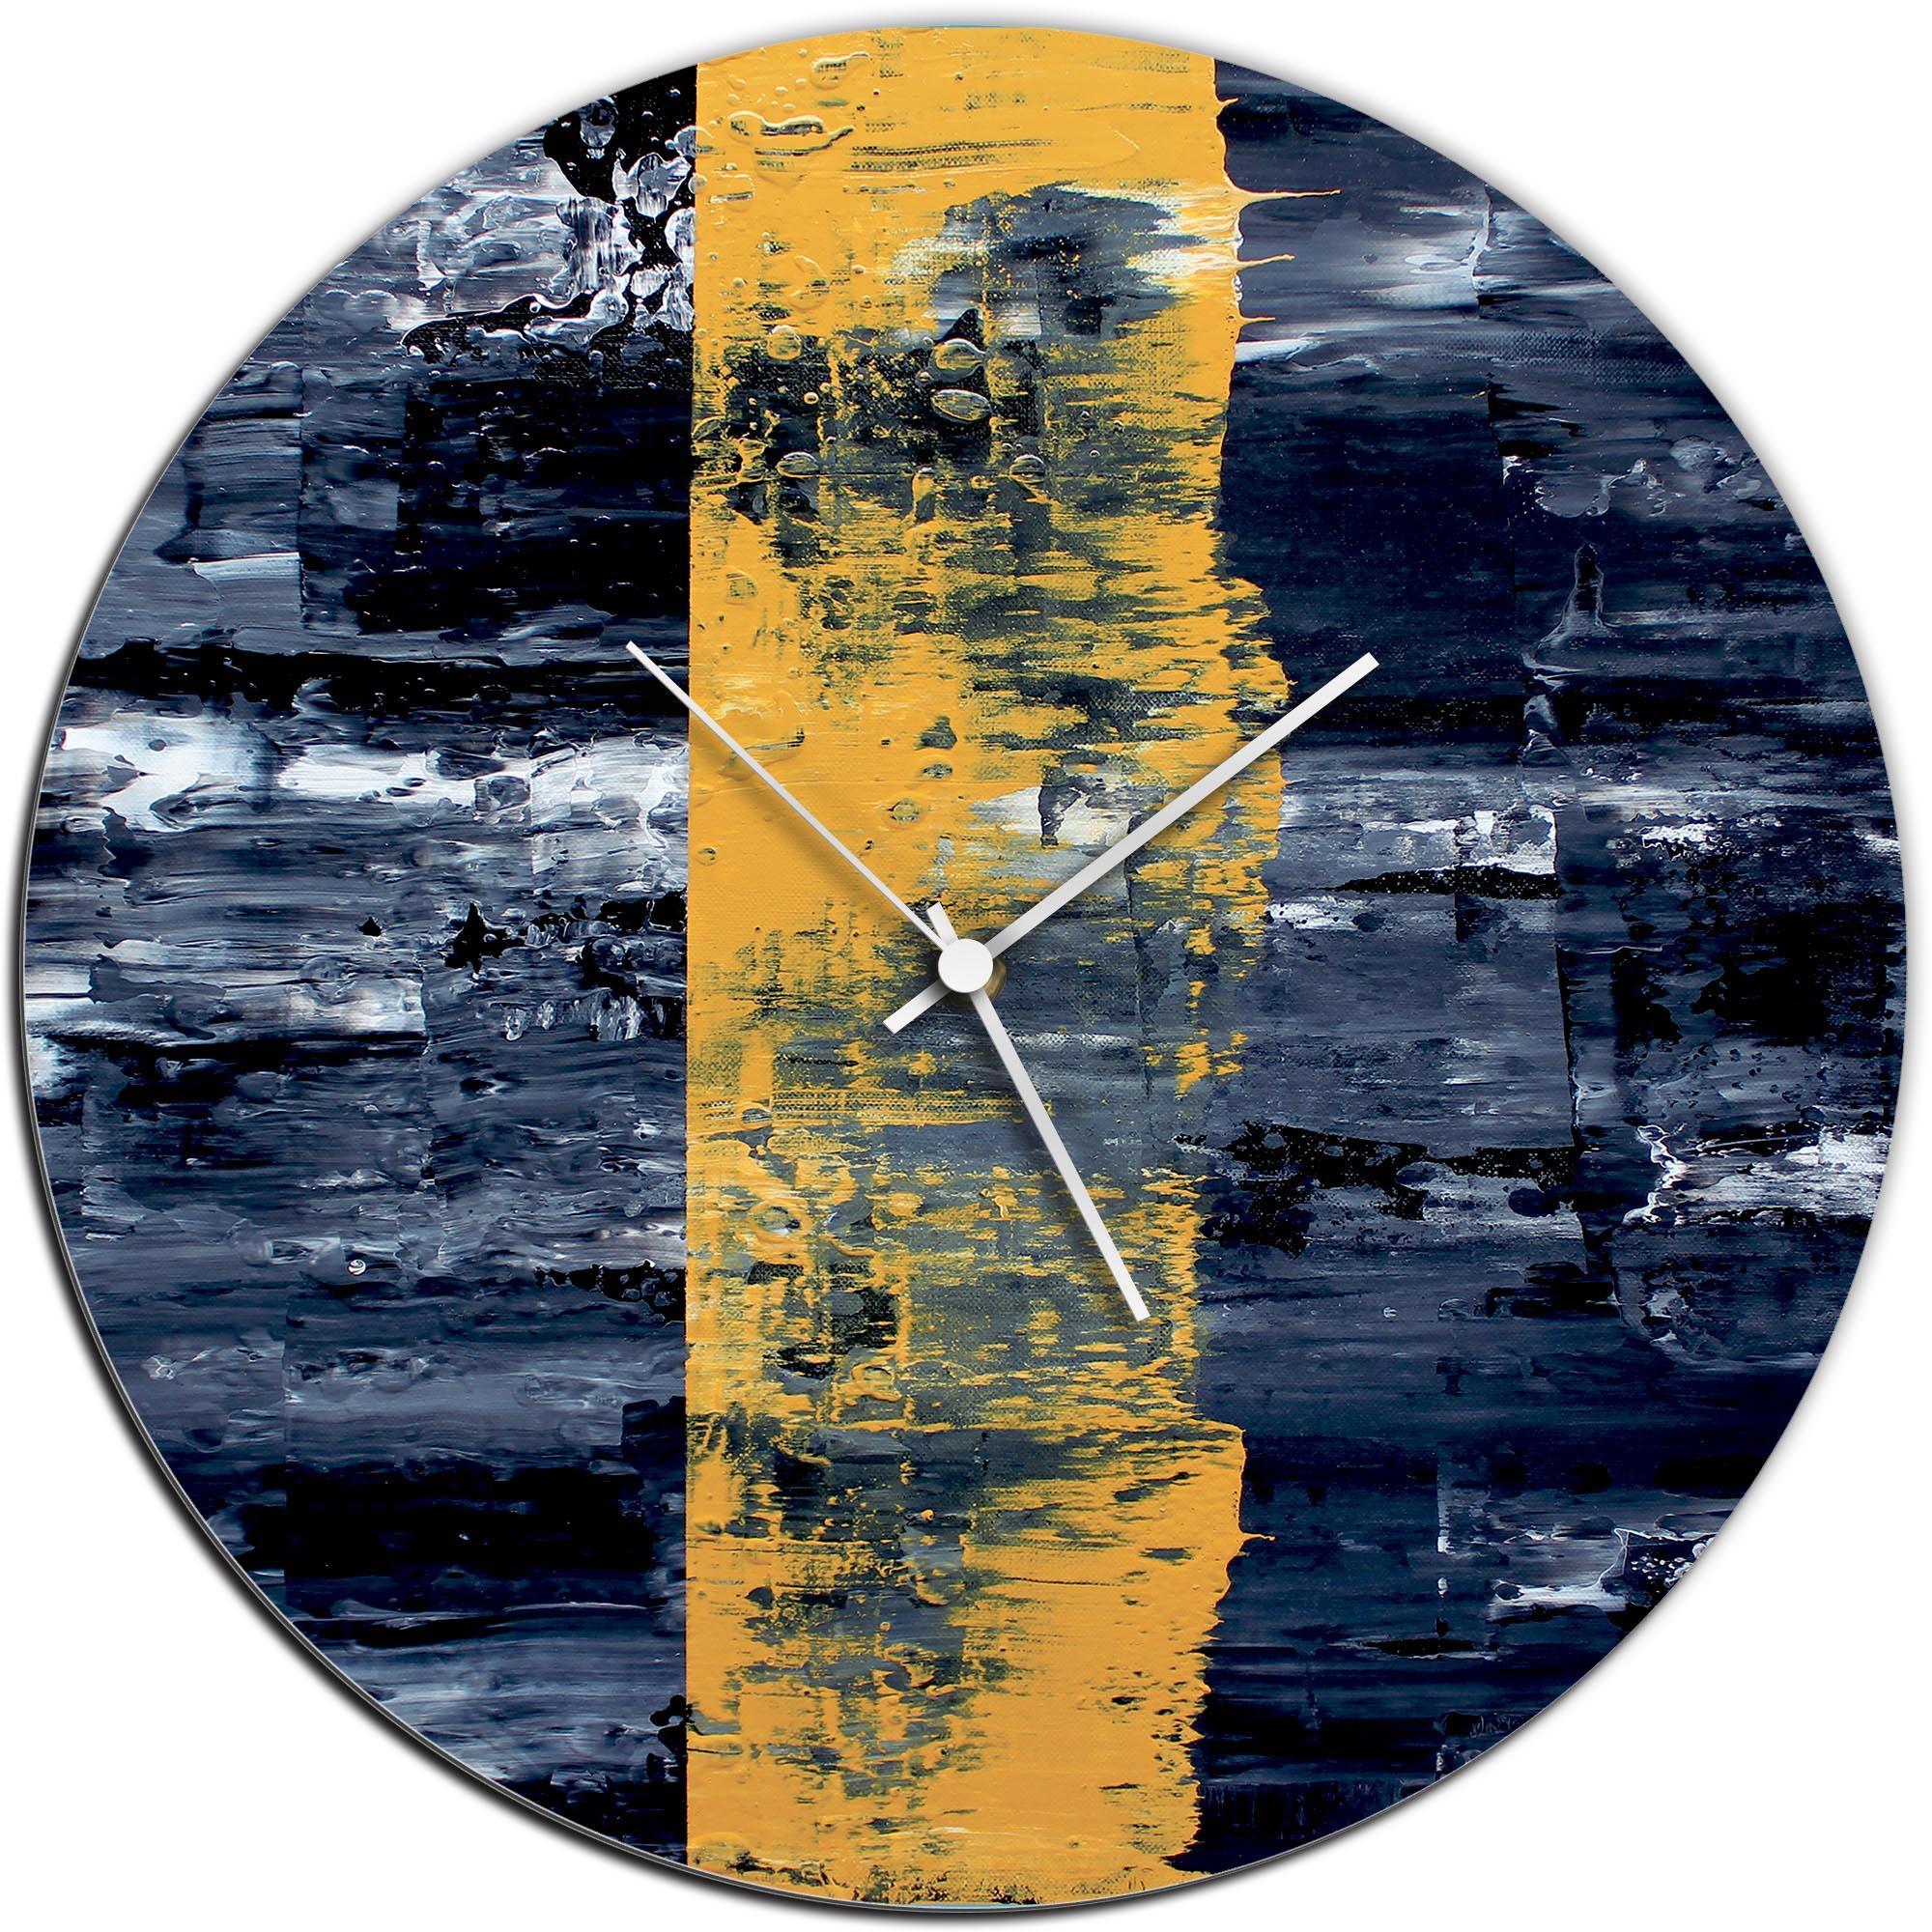 Mendo Vasilevski 'Yellow Line Circle Clock Large' 22in x 22in Modern Wall Clock on Aluminum Composite